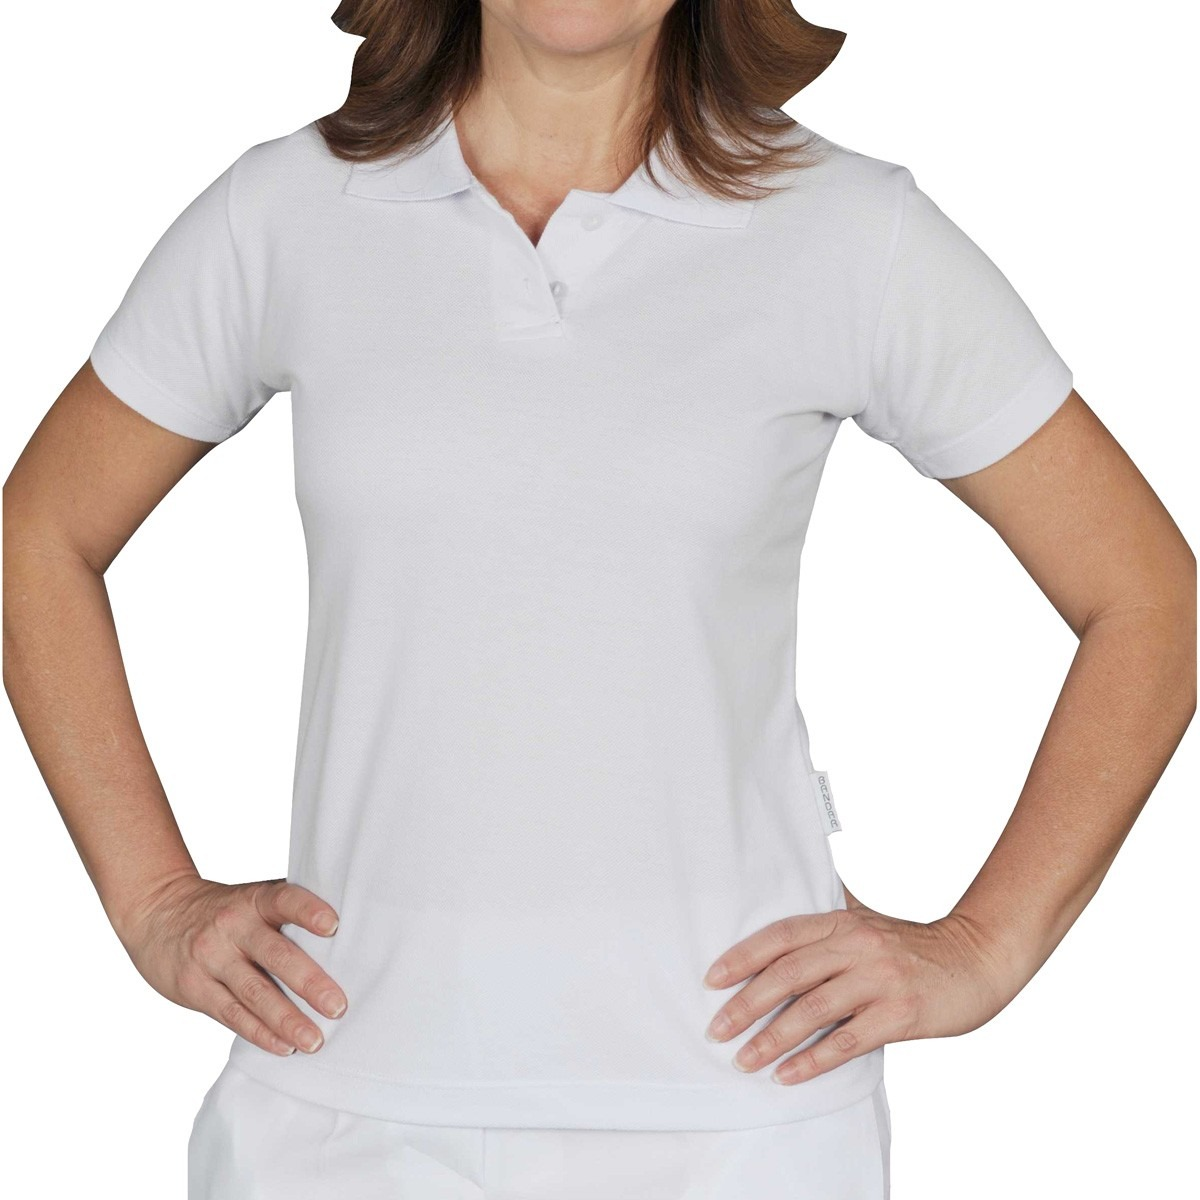 960fef04a9 camiseta polo piquet feminina branca manga curta bu26. Carregando zoom.